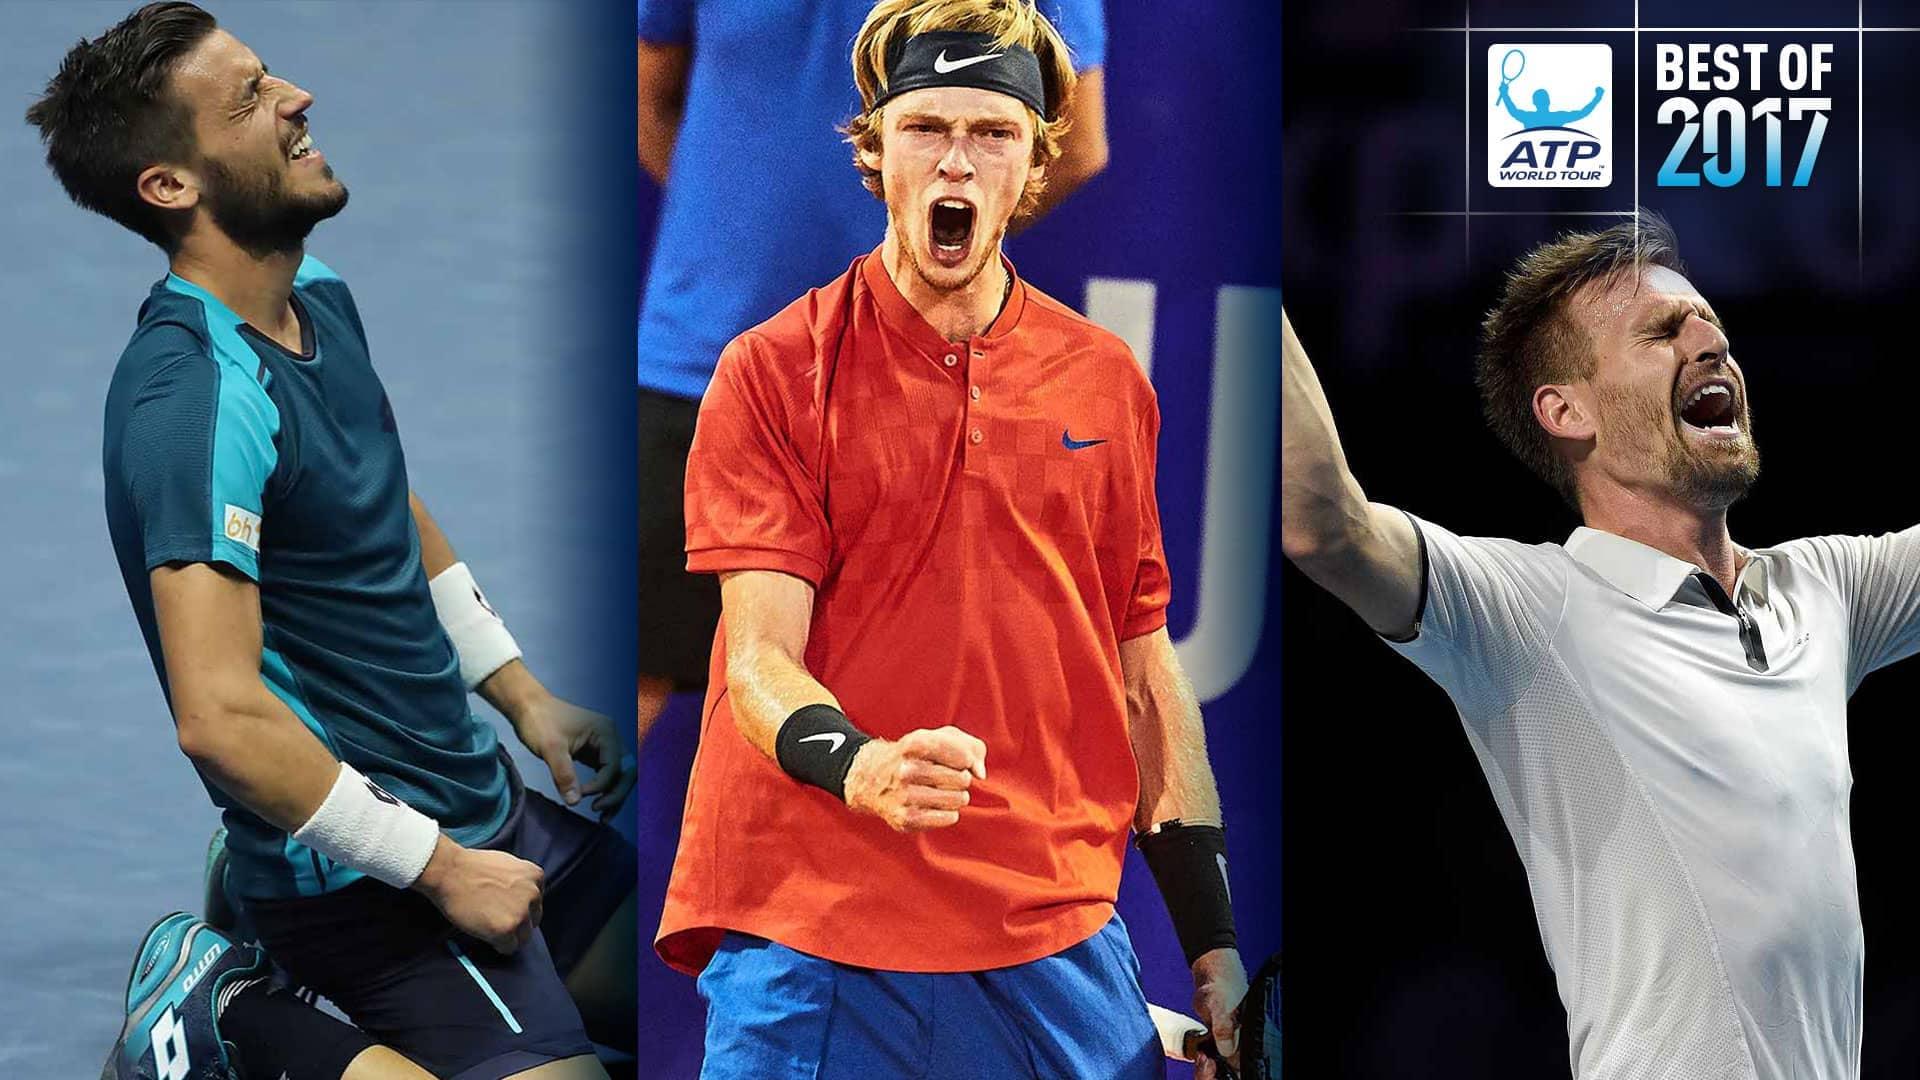 Best of 2017: First-Time Winners: Dzumhur, Rublev, Gojowczyk | ATP Tour | Tennis